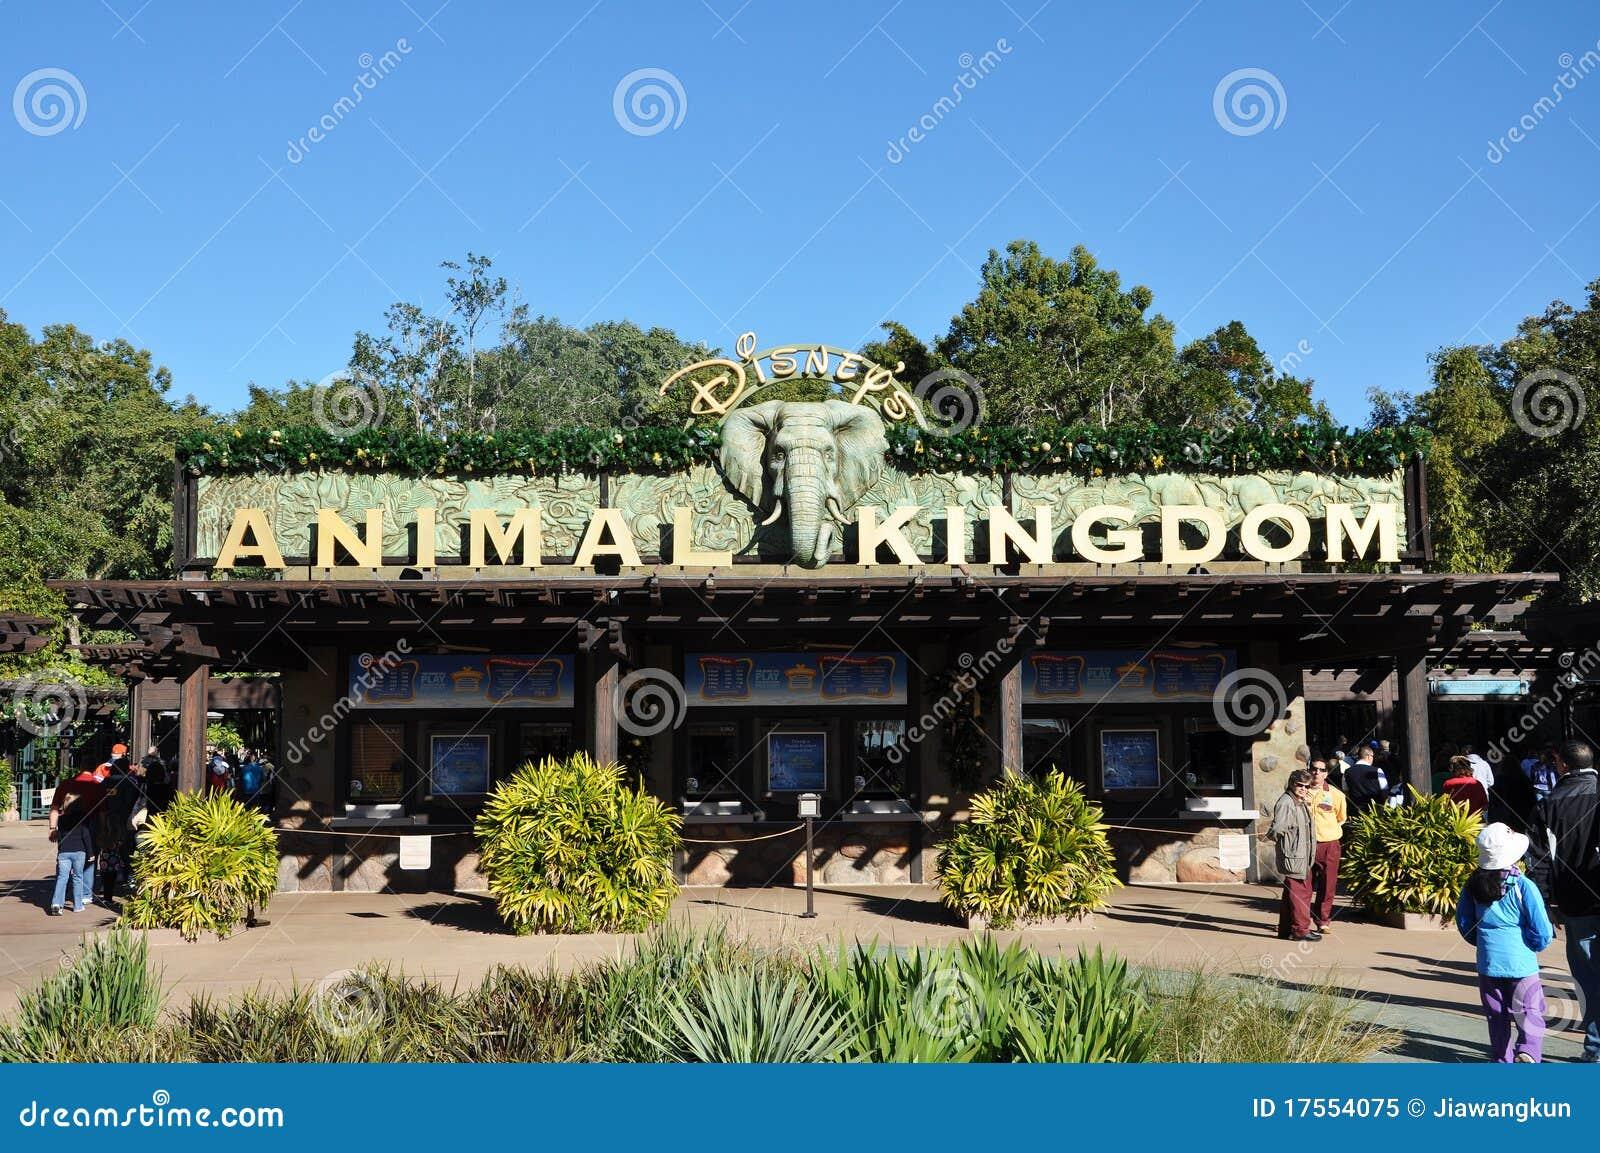 Entrance of Disney Animal Kingdom